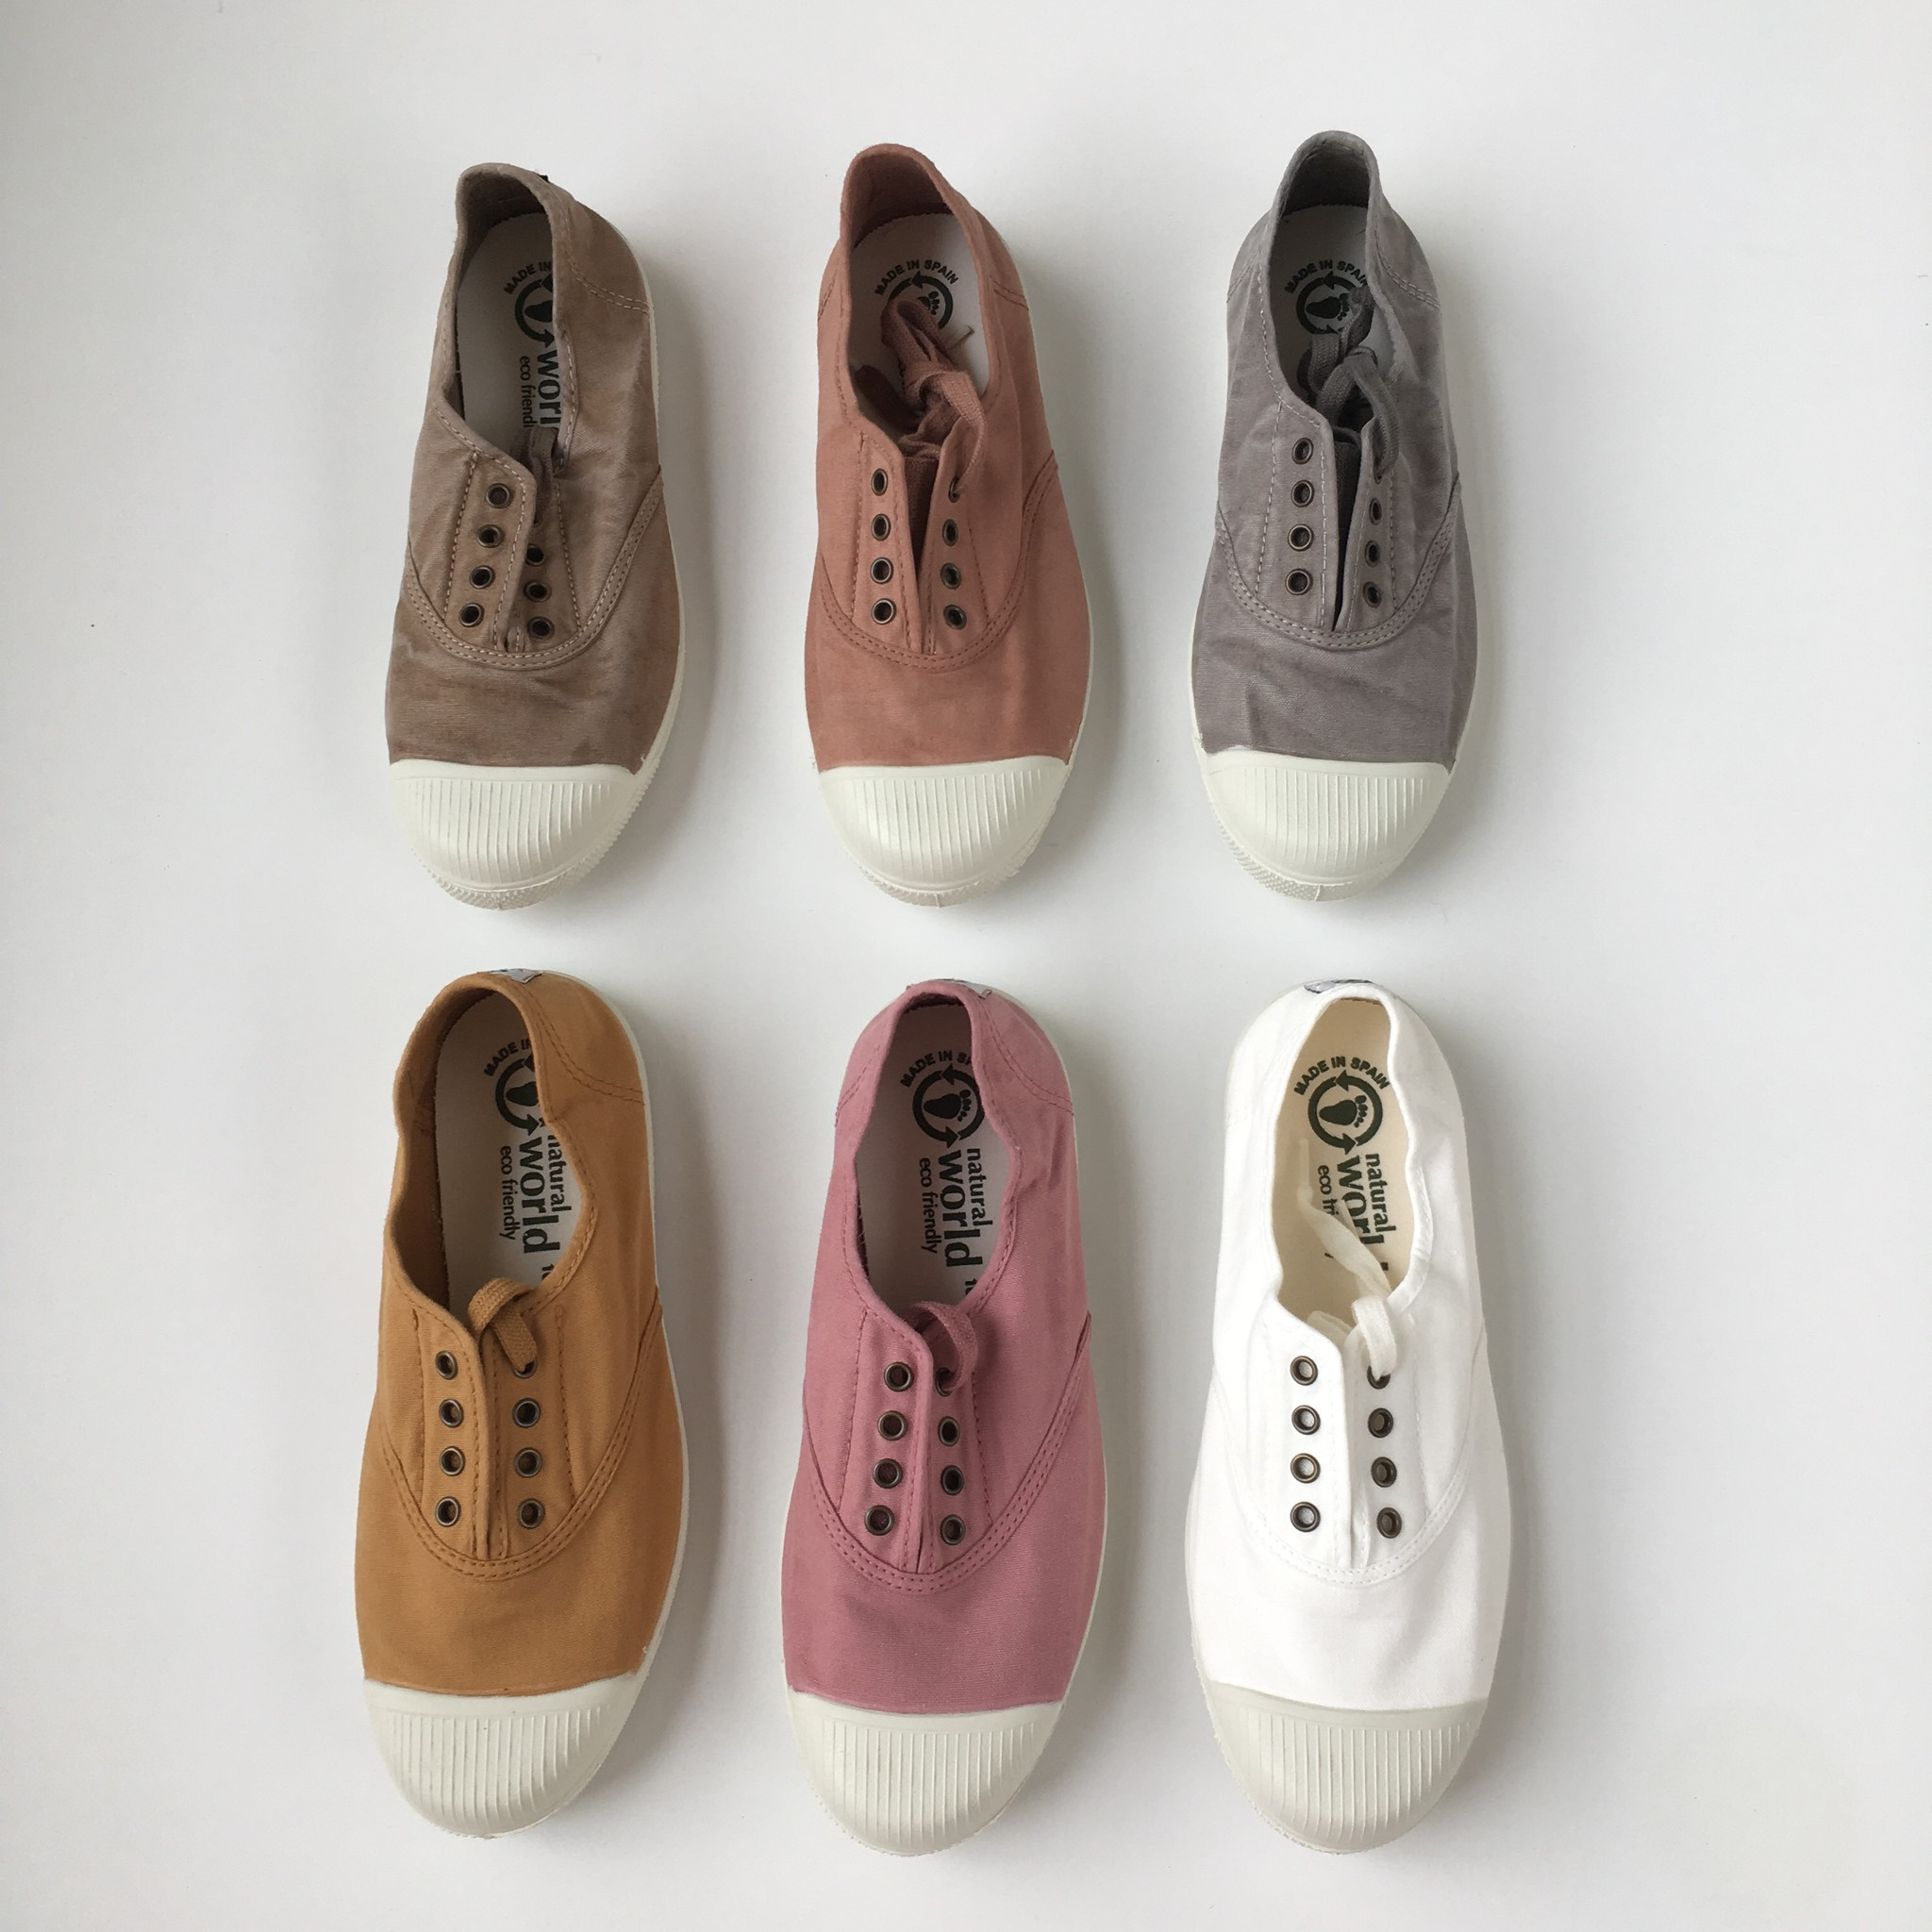 NATURAL WORLD - eco sneakers dames - 100% biologisch katoen/100% natuur rubber - stone washed khaki groen